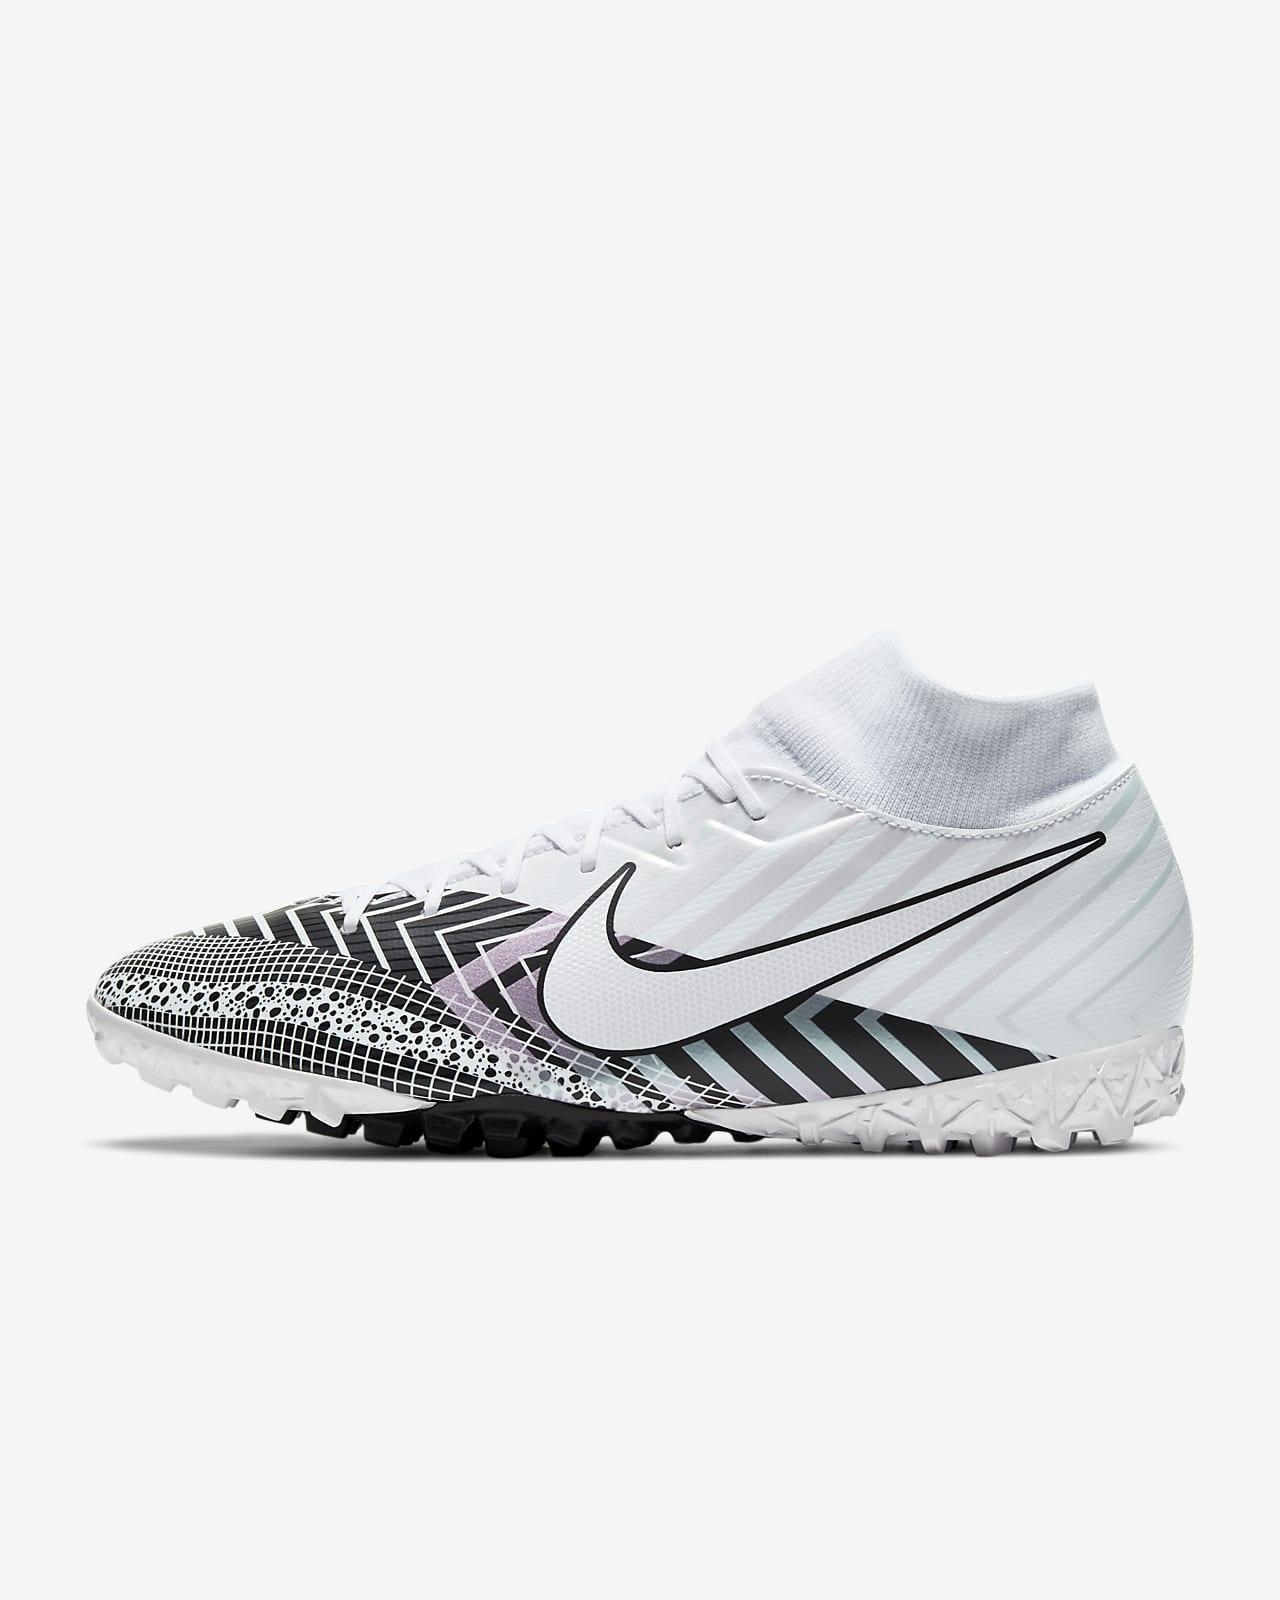 Nike Mercurial Superfly 7 Academy MDS TF 人工草地足球鞋